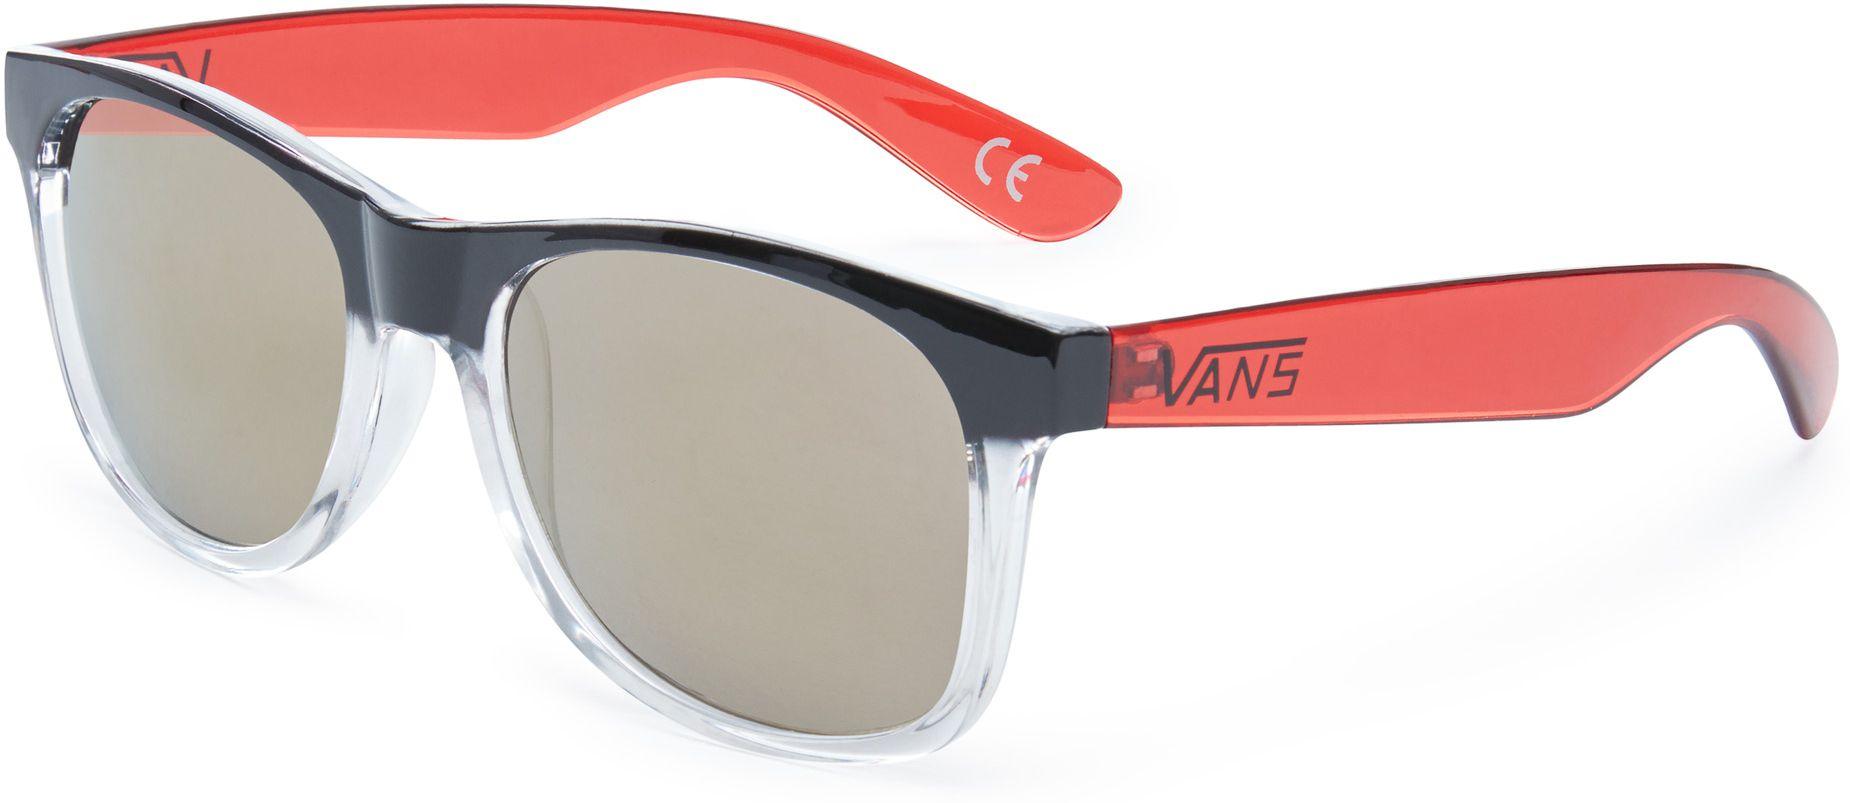 slnečné okuliare vans SPICOLI 4 SHADES Clear Black Chili Pepper eda6f893ce6